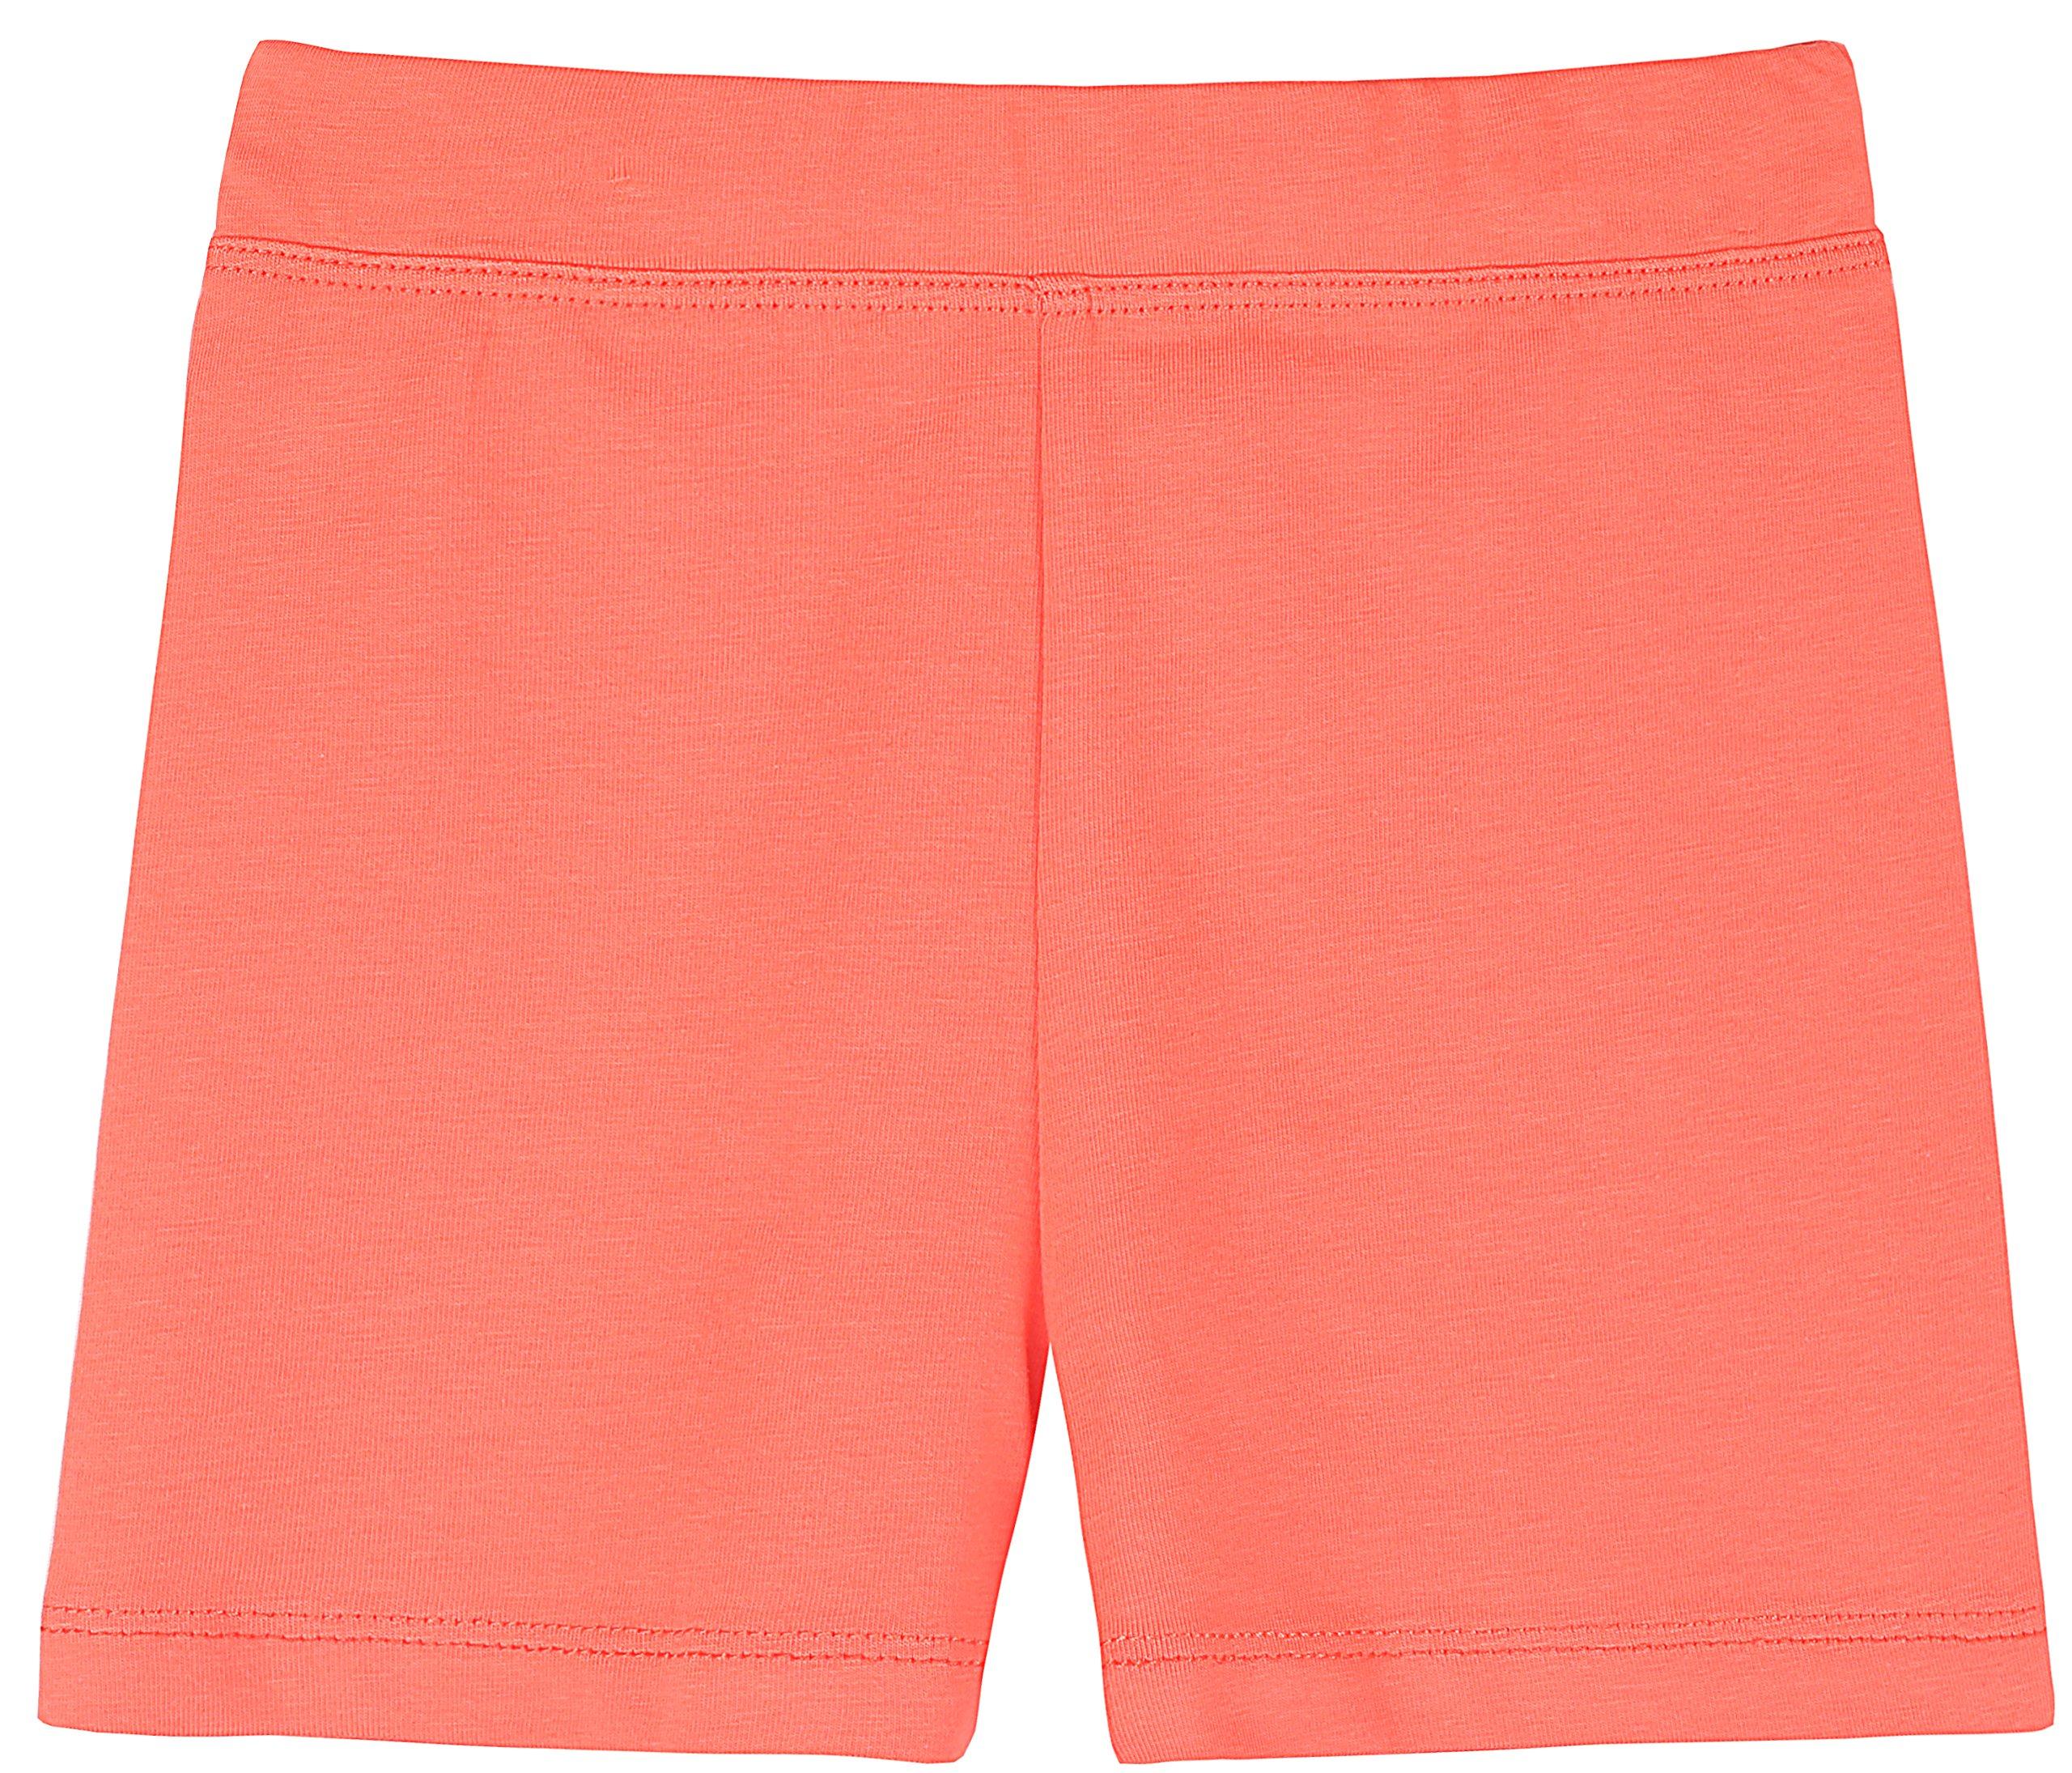 Lovetti Girls' Basic Solid Soft Dance Short for Gymnastics Or Under Skirts 3T Orange